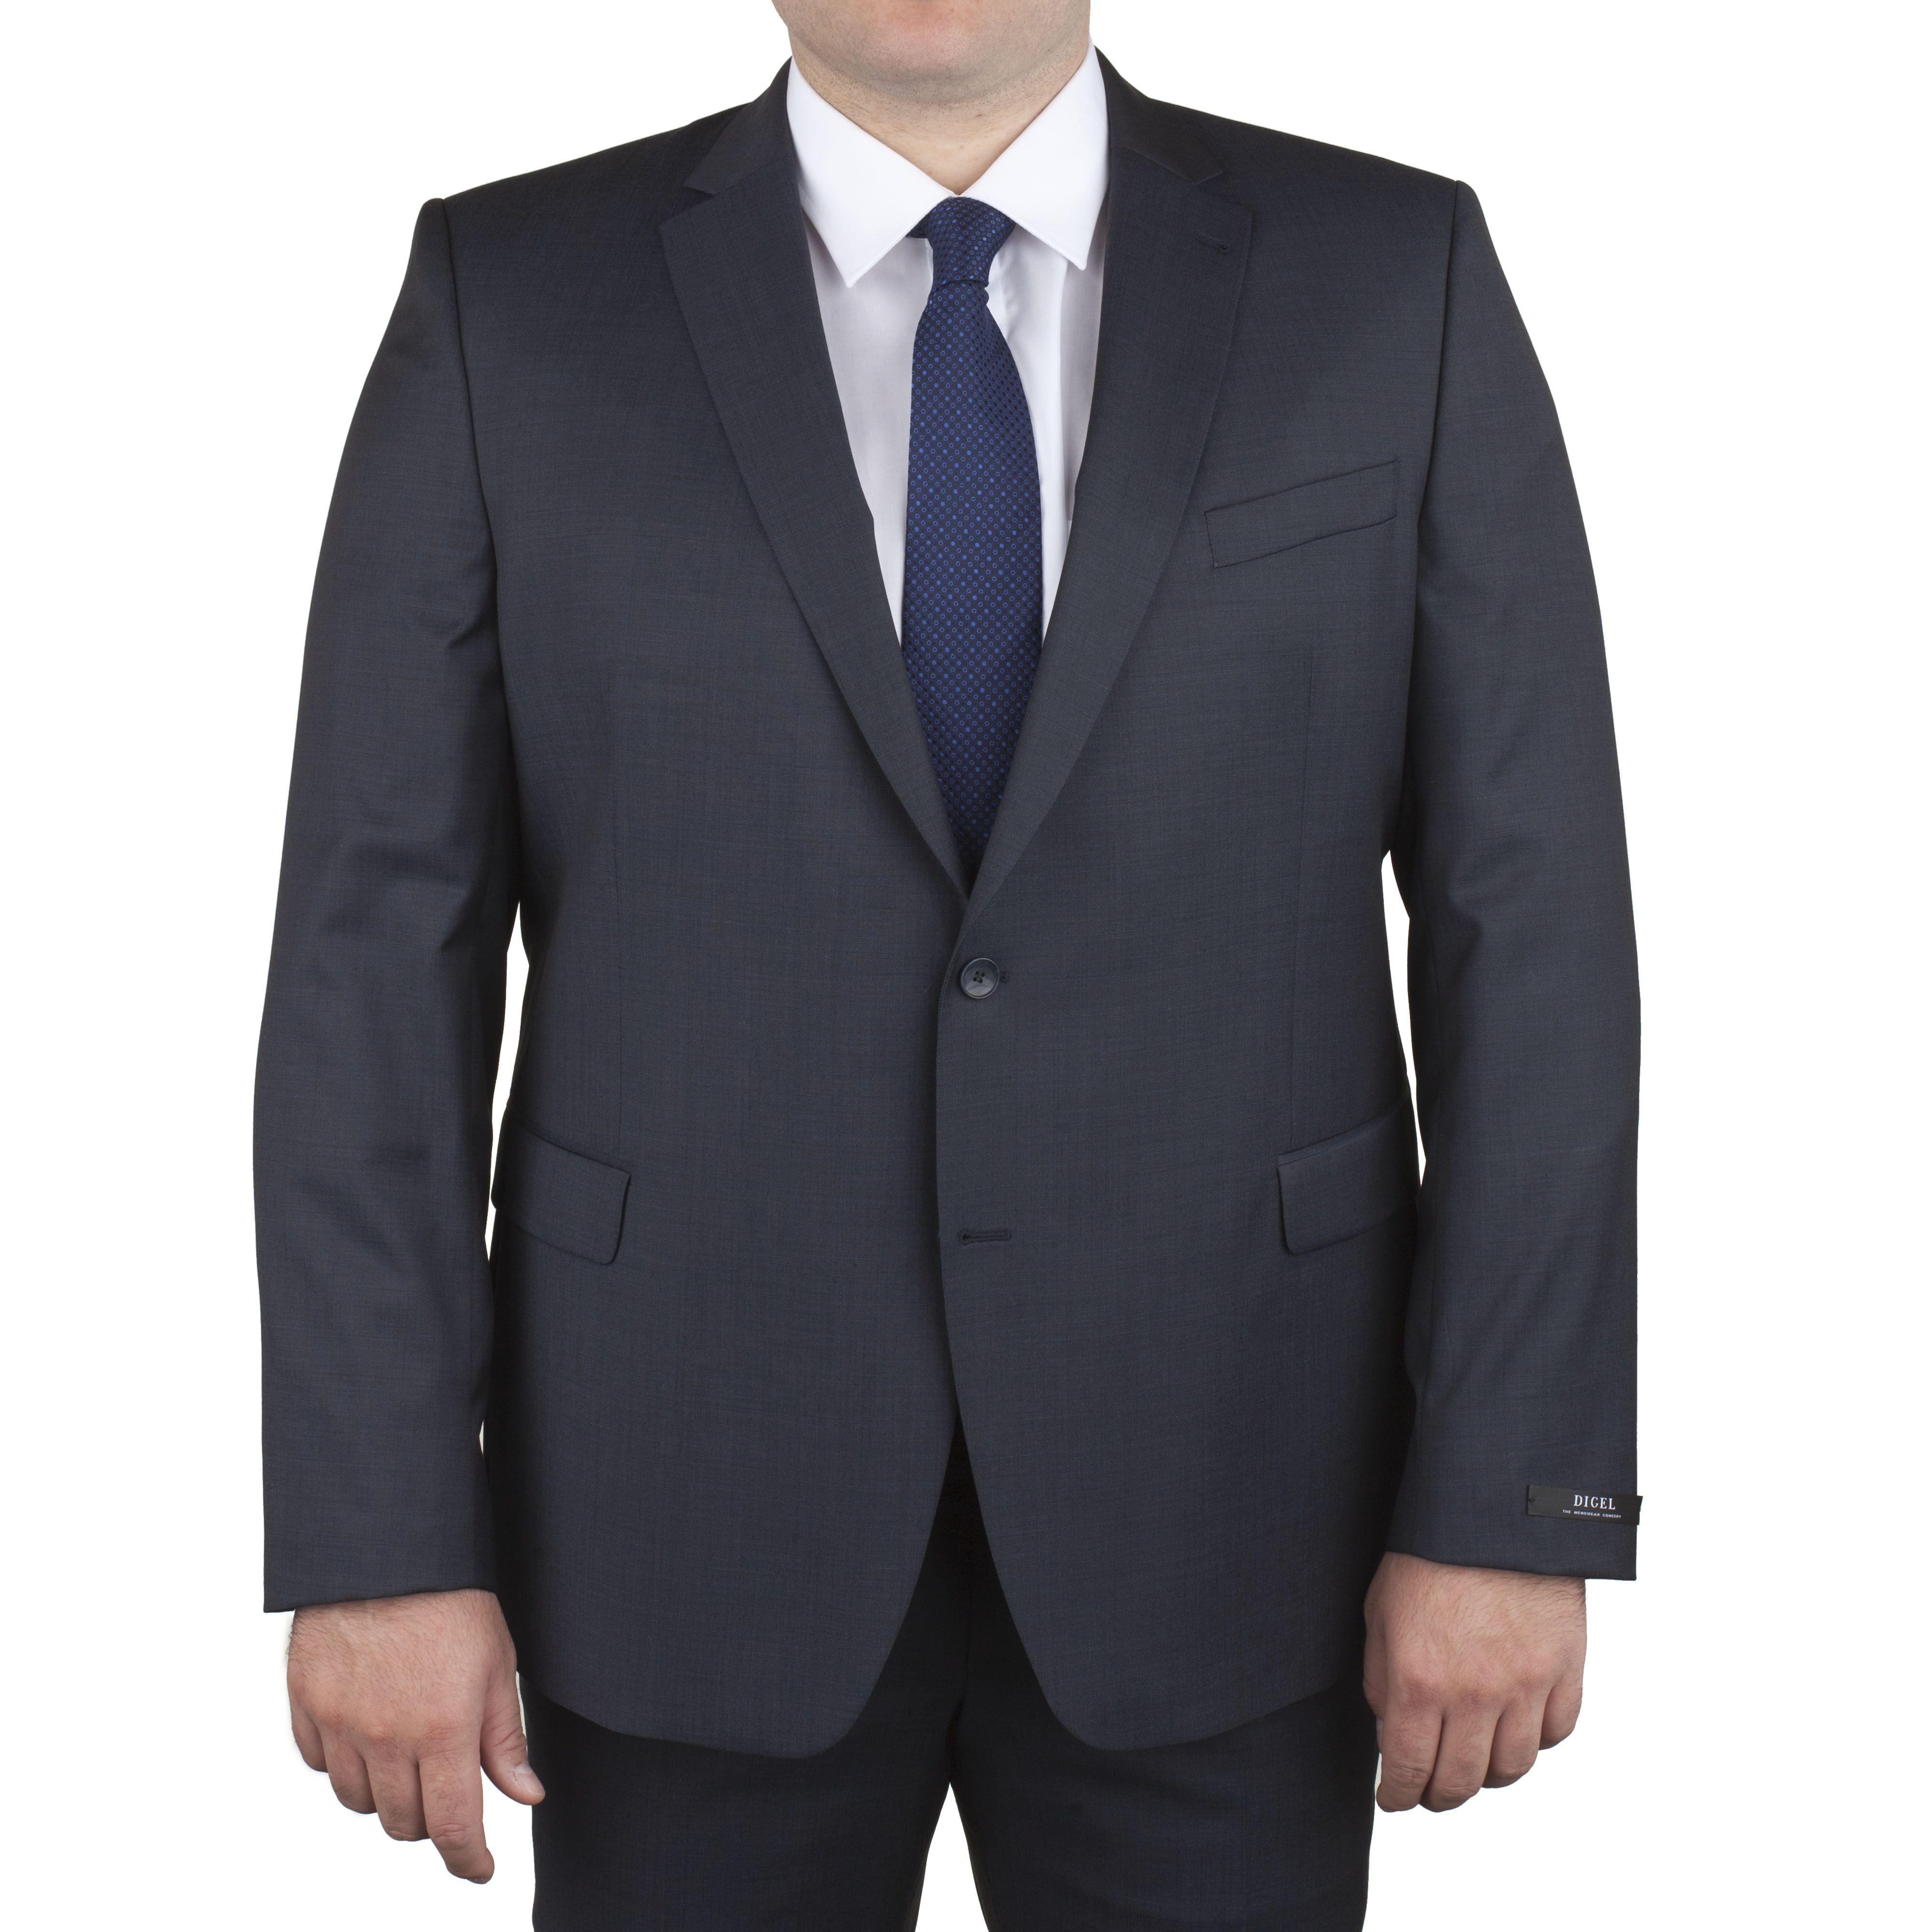 veste de costume pr f rence gris bleut pour homme fort du 60 au 68 digel size factory digel. Black Bedroom Furniture Sets. Home Design Ideas